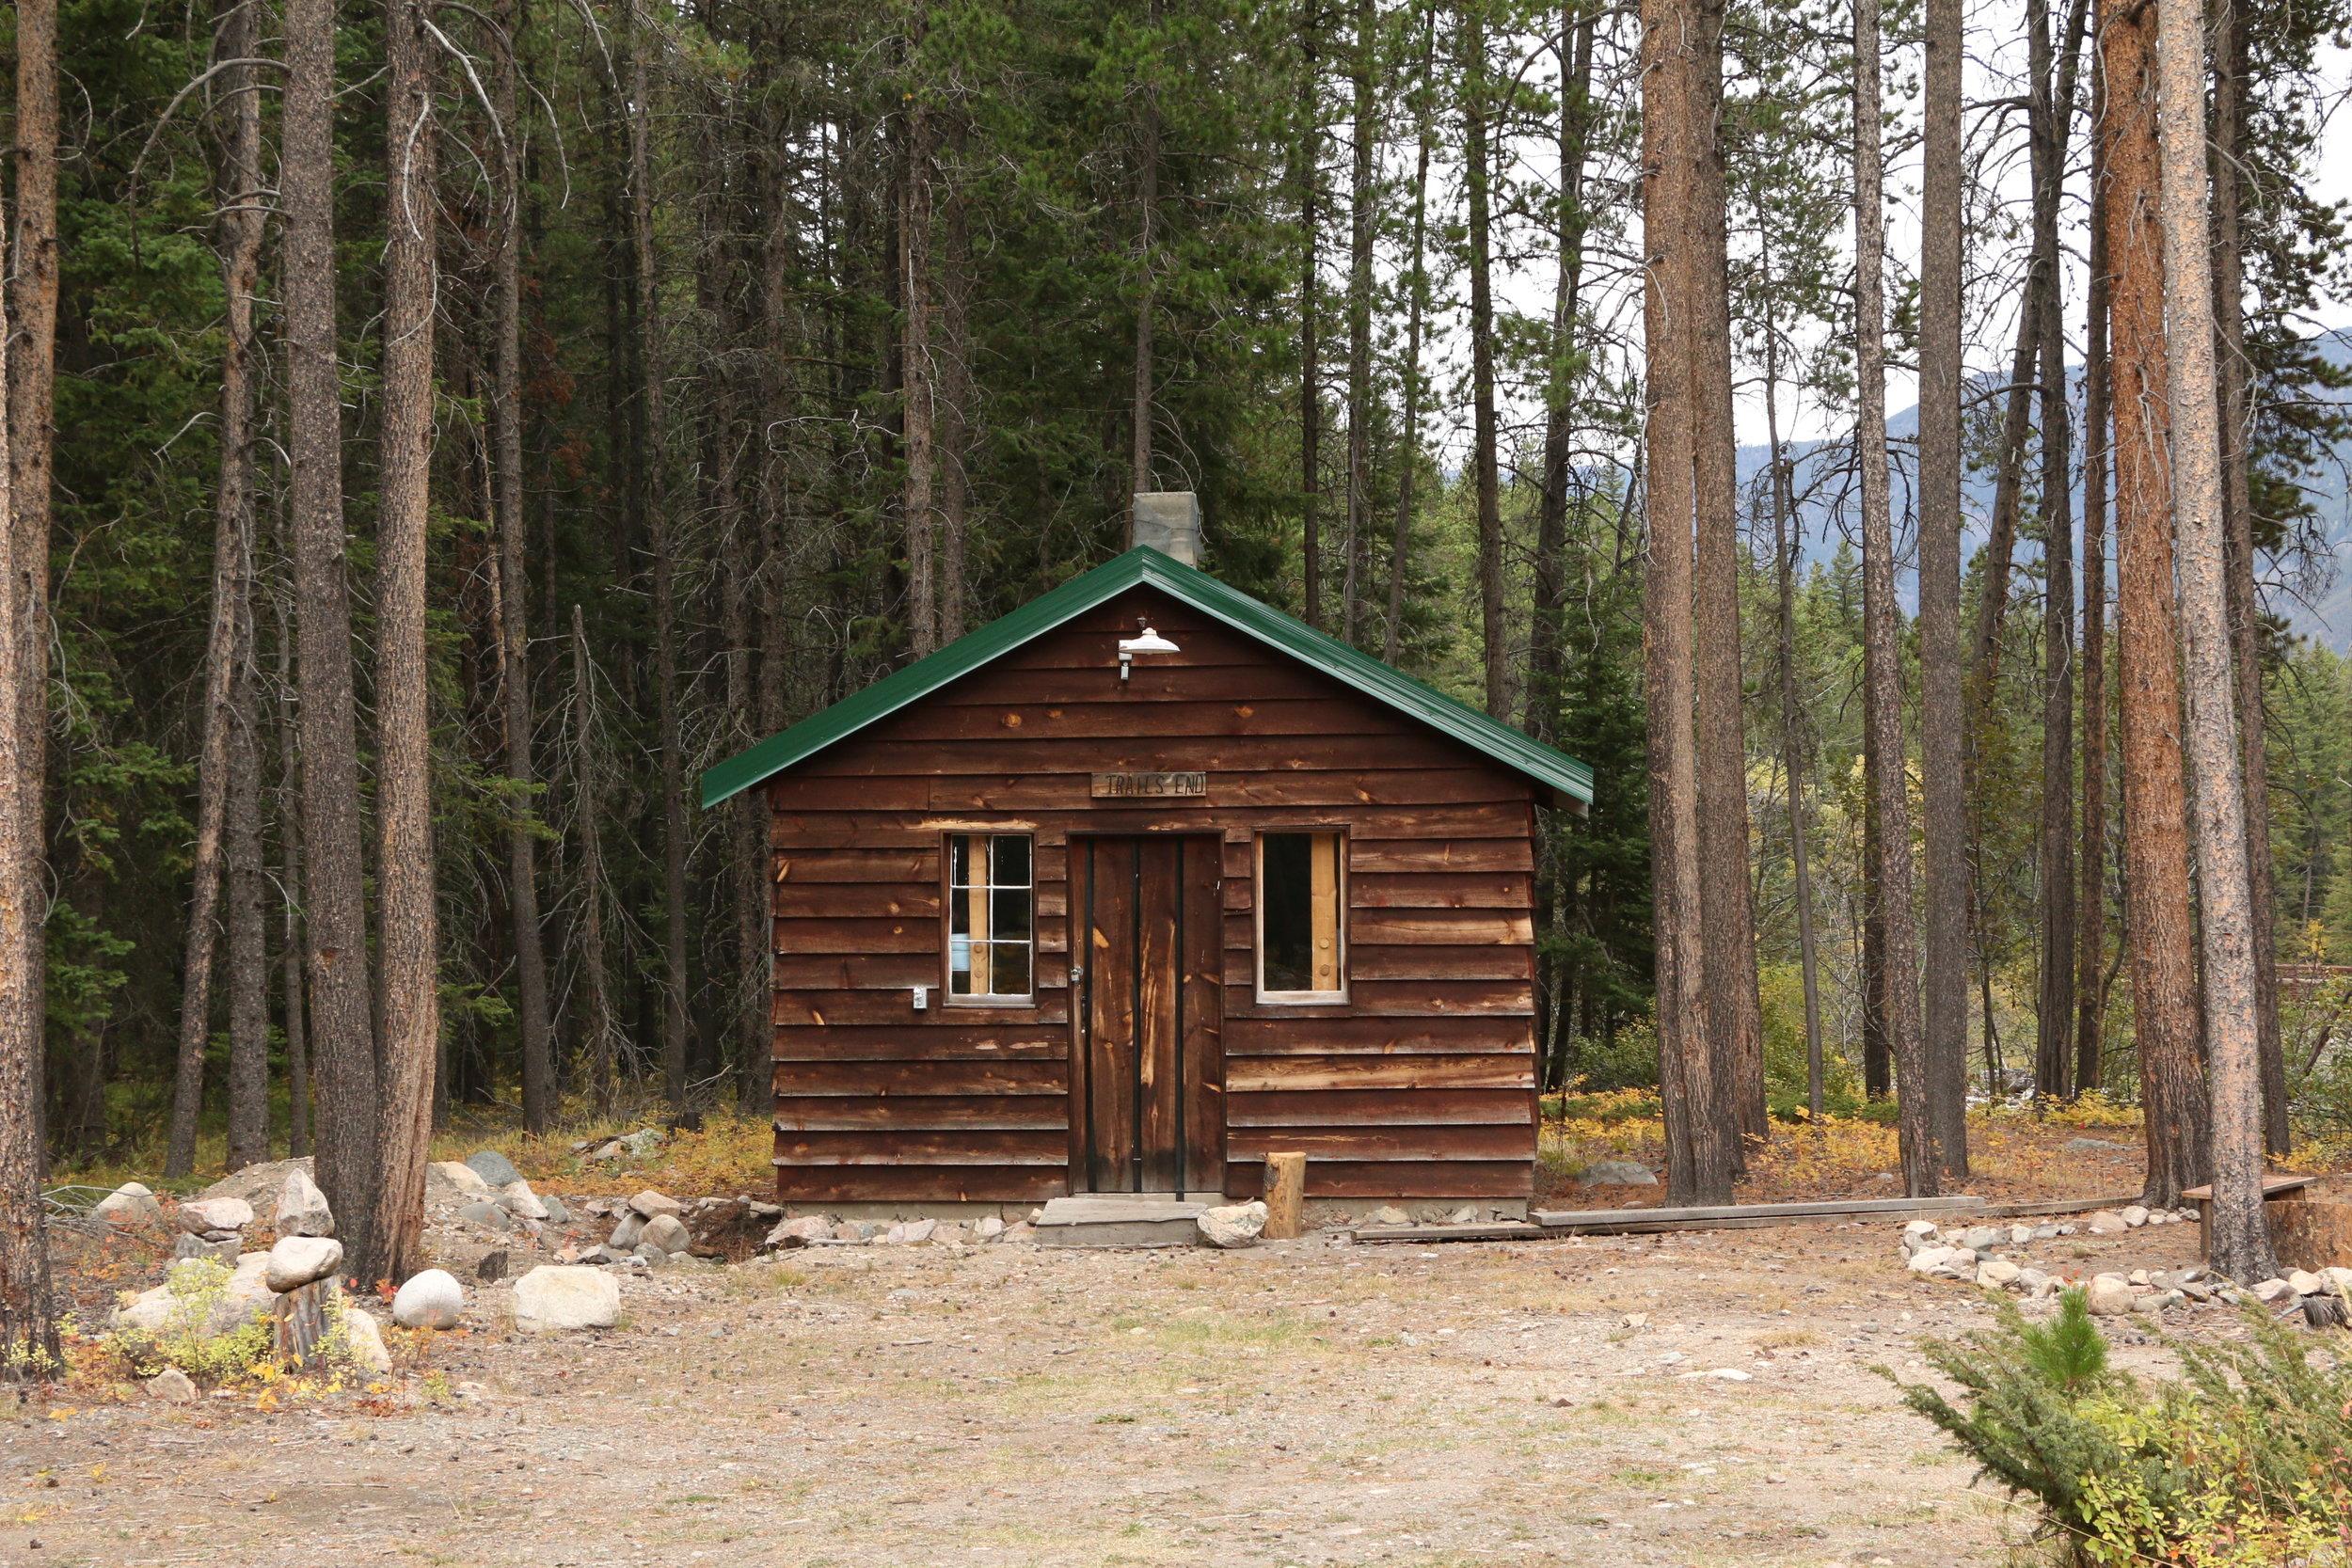 Montana - McLoed, August 23-26, 2019